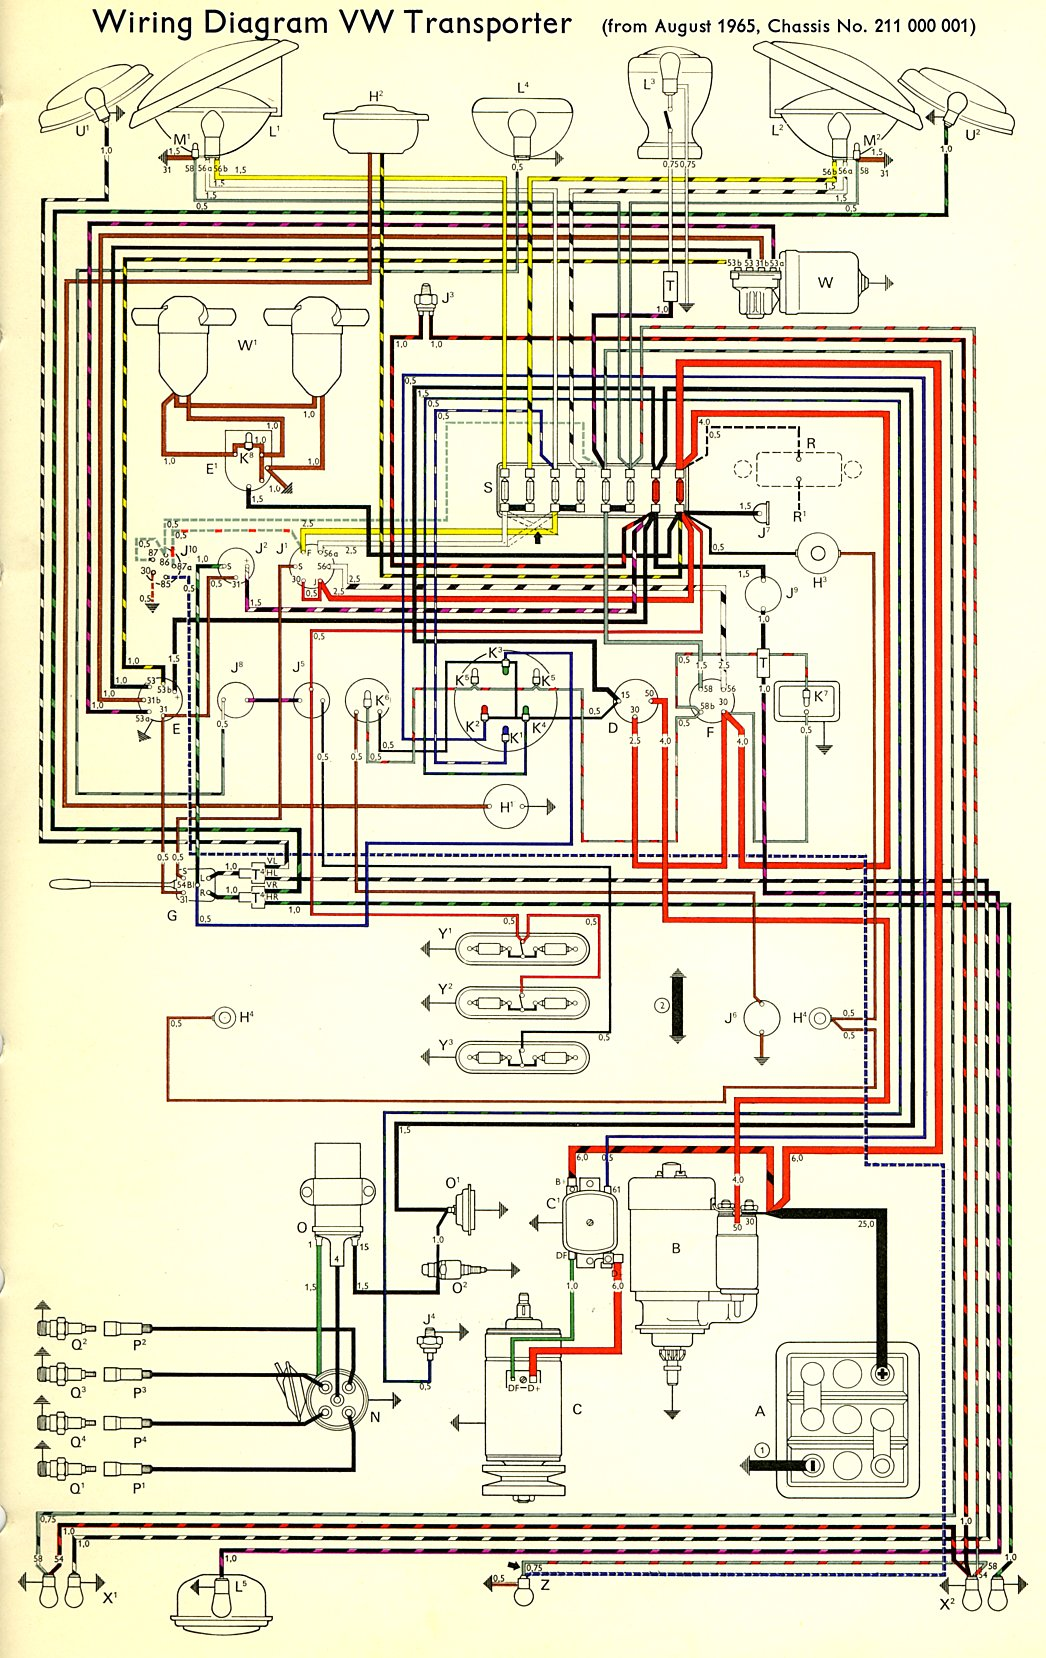 1968 Vw Bug Wiring Diagram 1966 Bus Wiring Diagram Thegoldenbug Com